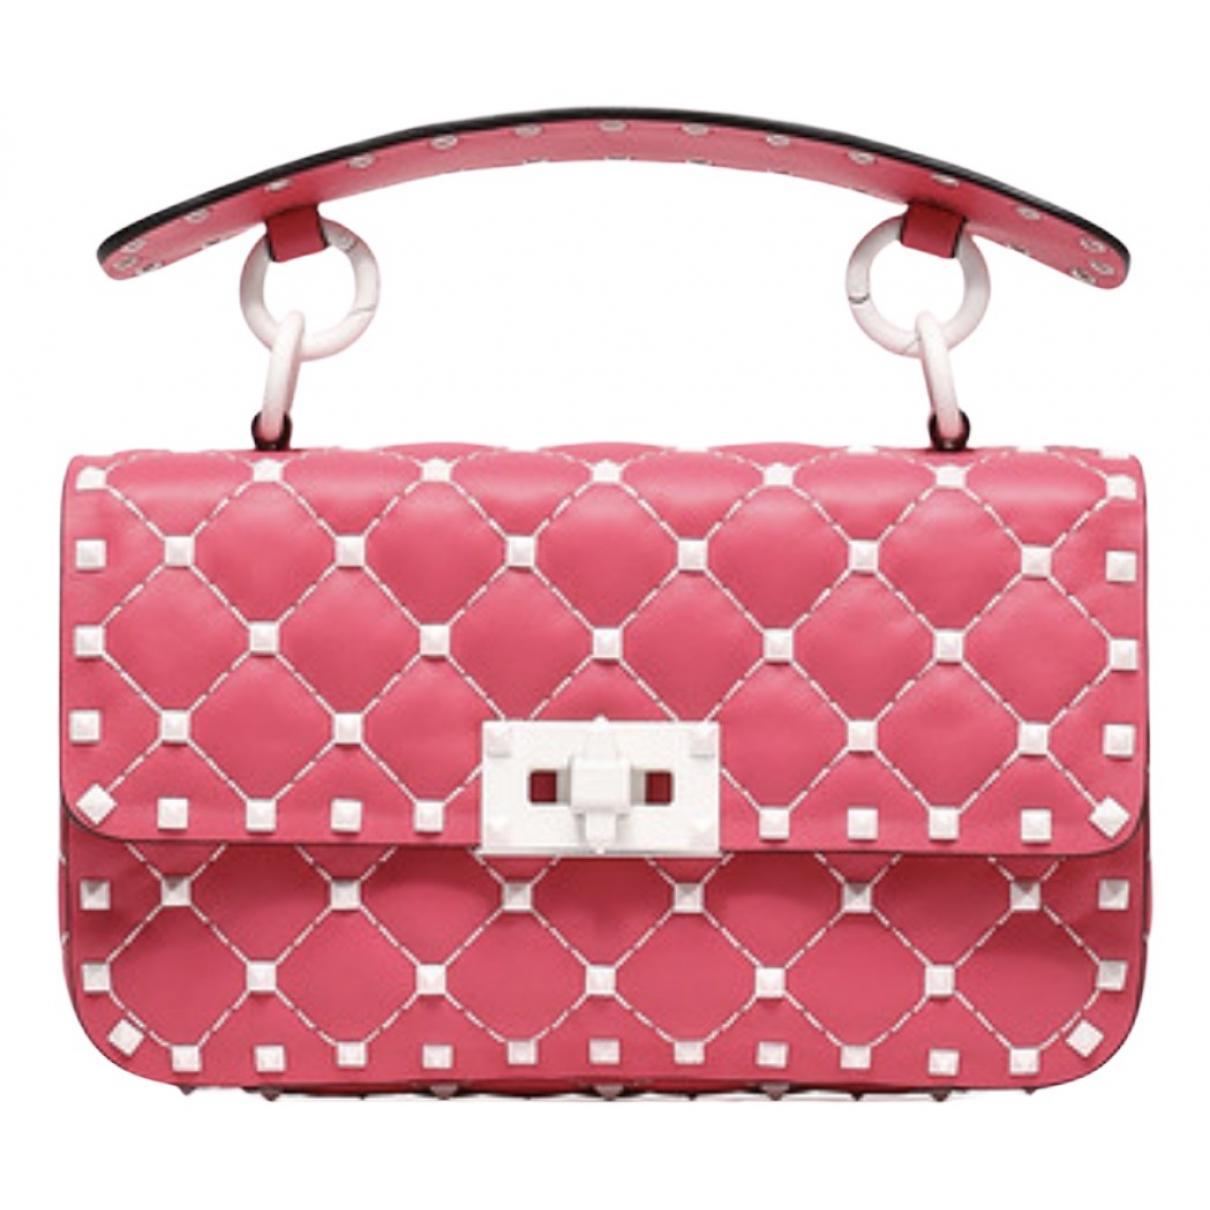 Valentino Garavani Rockstud spike Pink Leather handbag for Women N